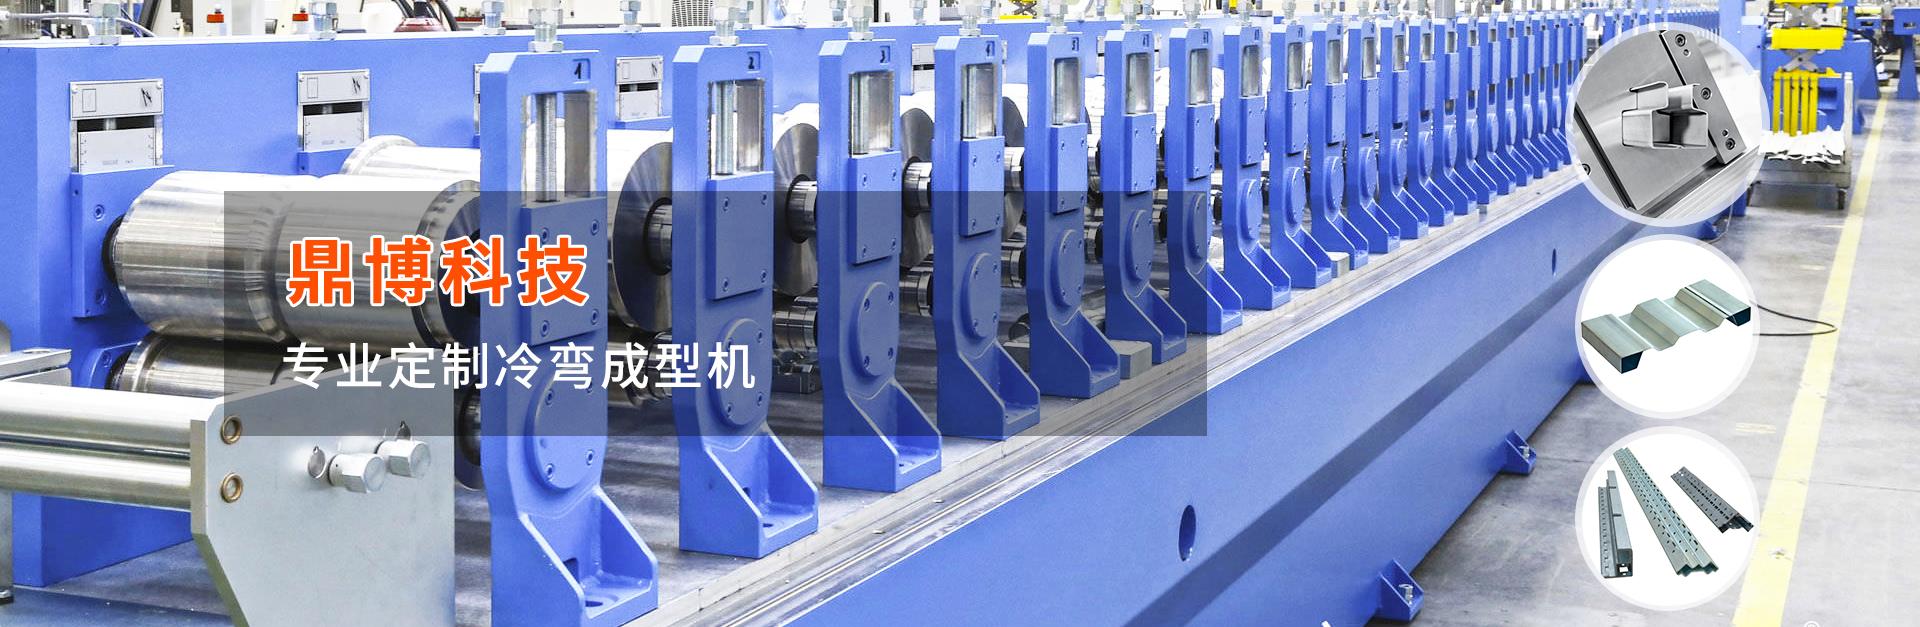 Dingbo Technology